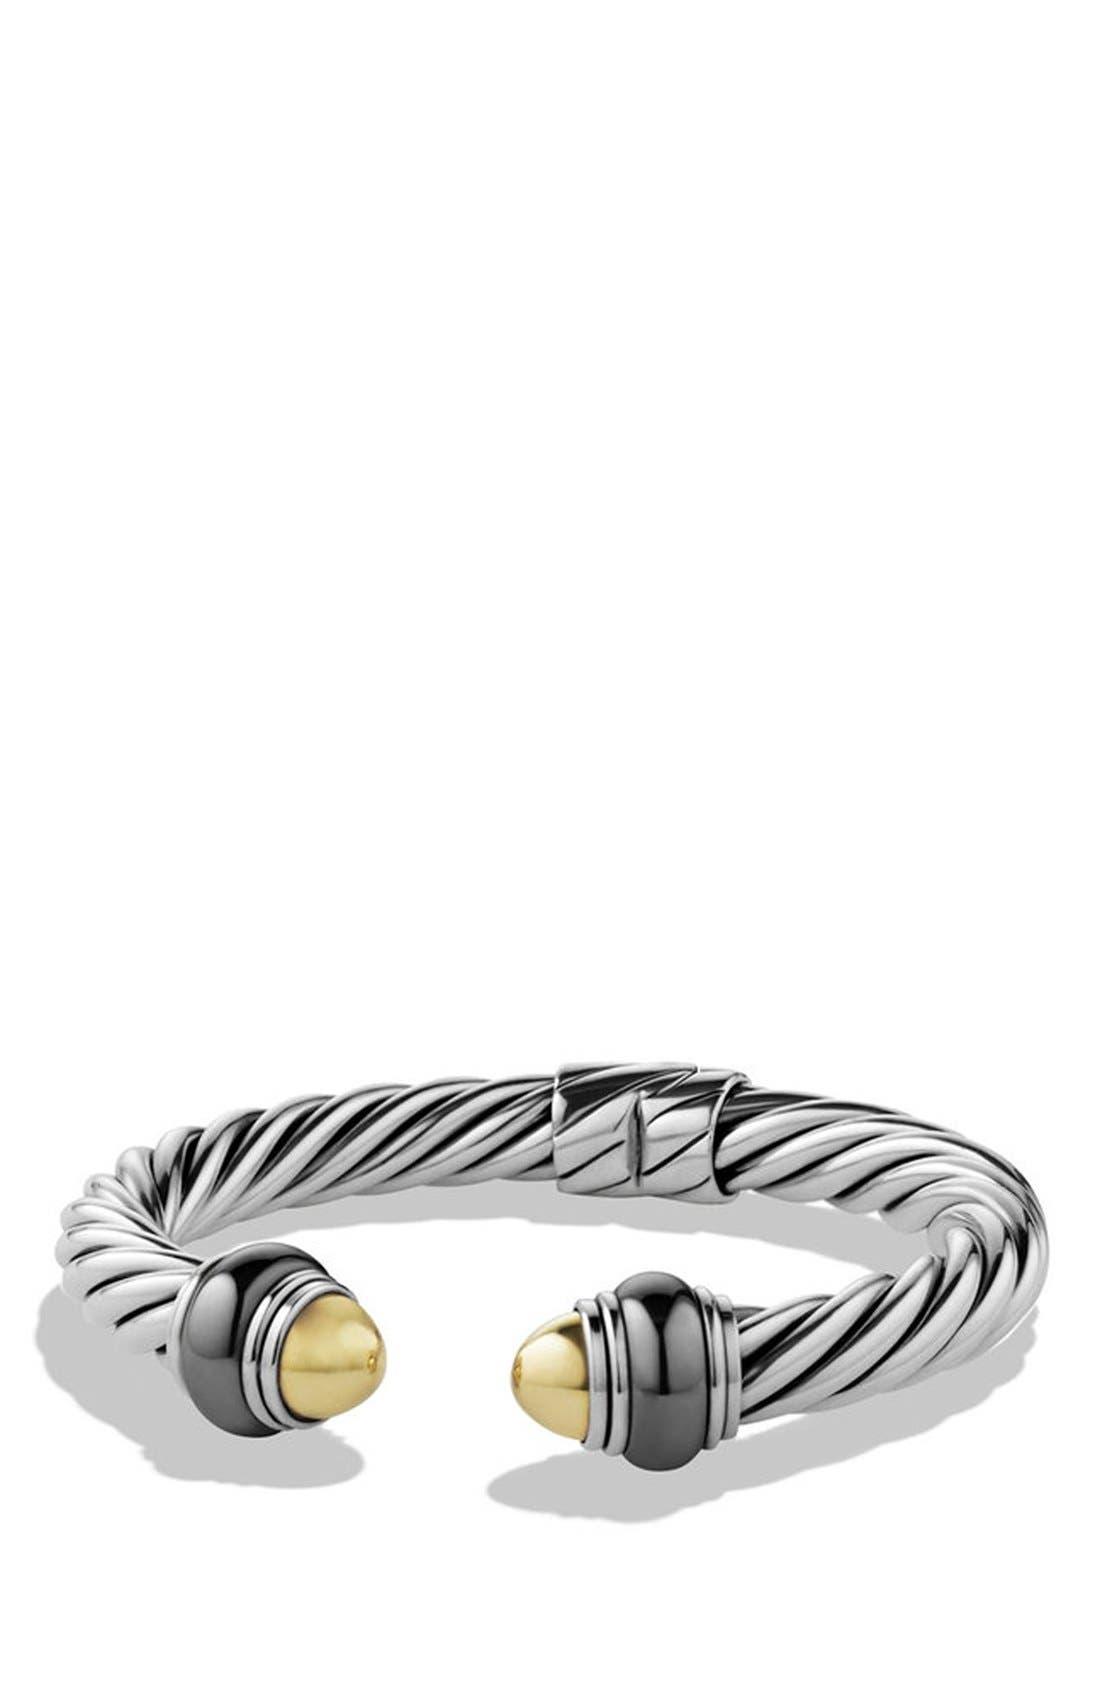 Main Image - David Yurman 'Cable Classics' Bracelet